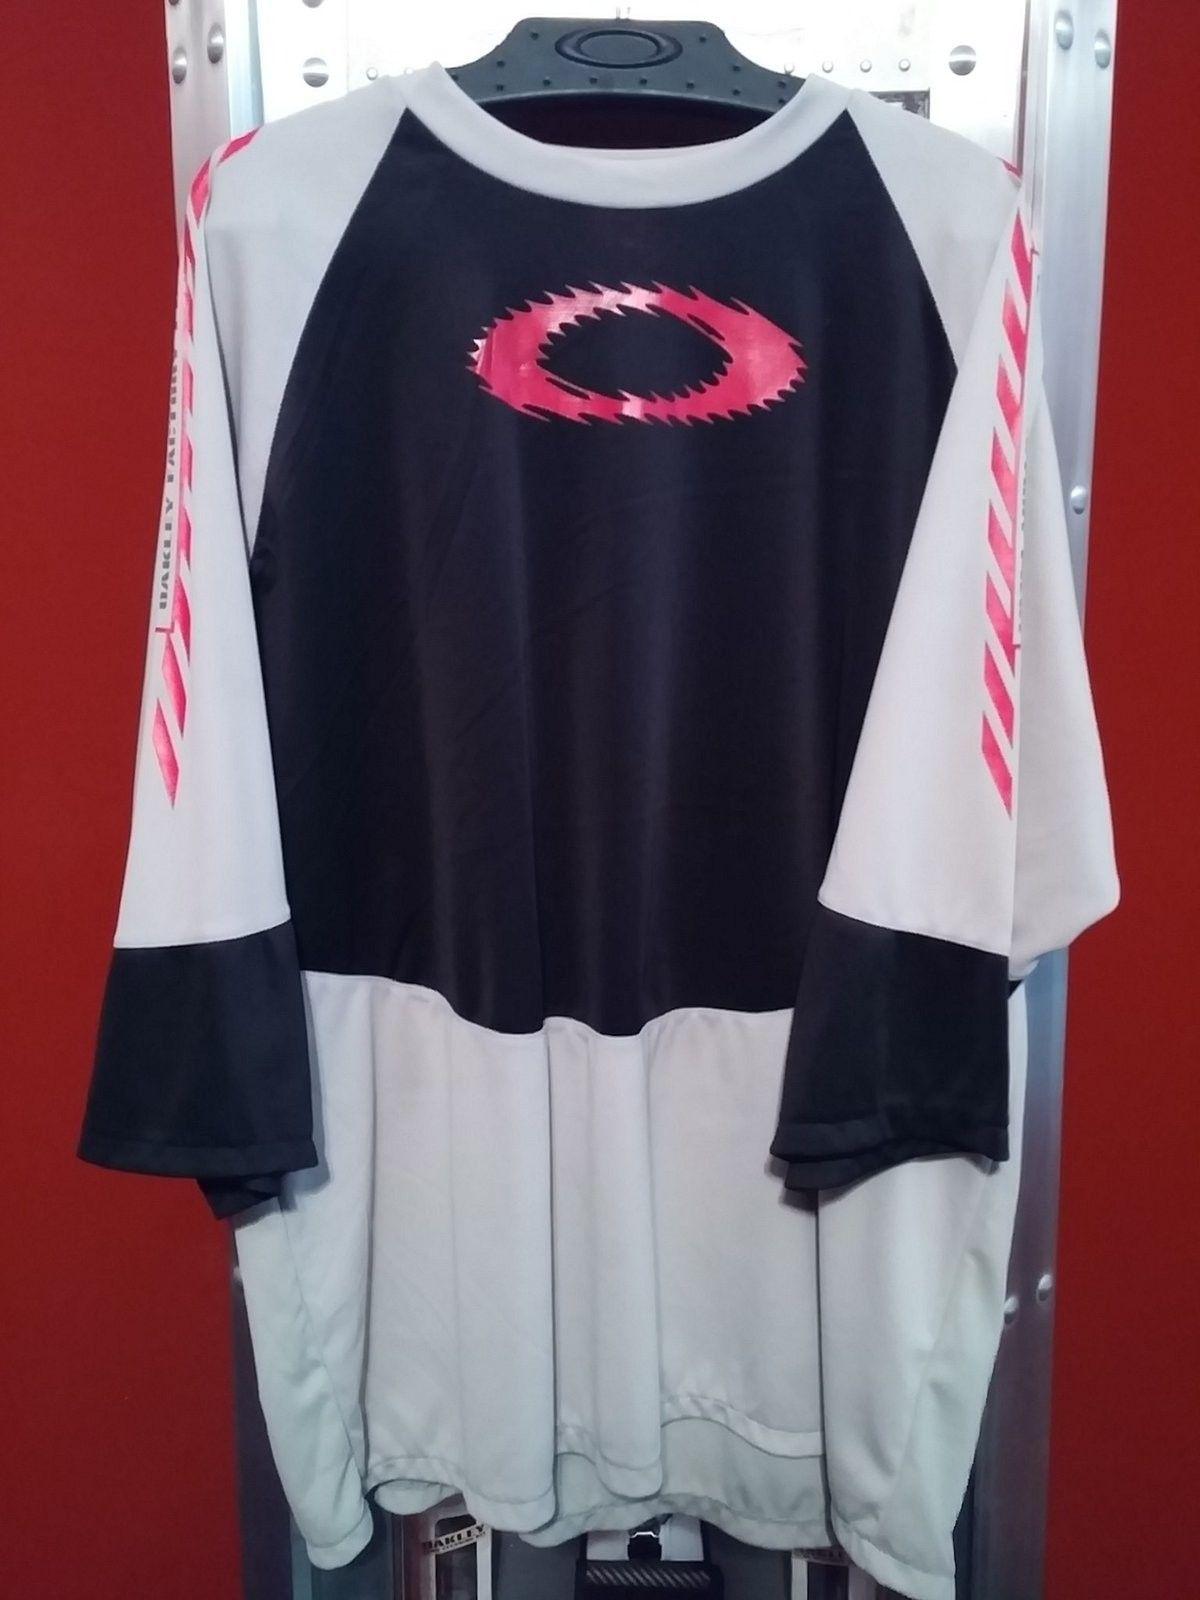 Oakley MTB Jerseys. - 20150117_081628.jpg